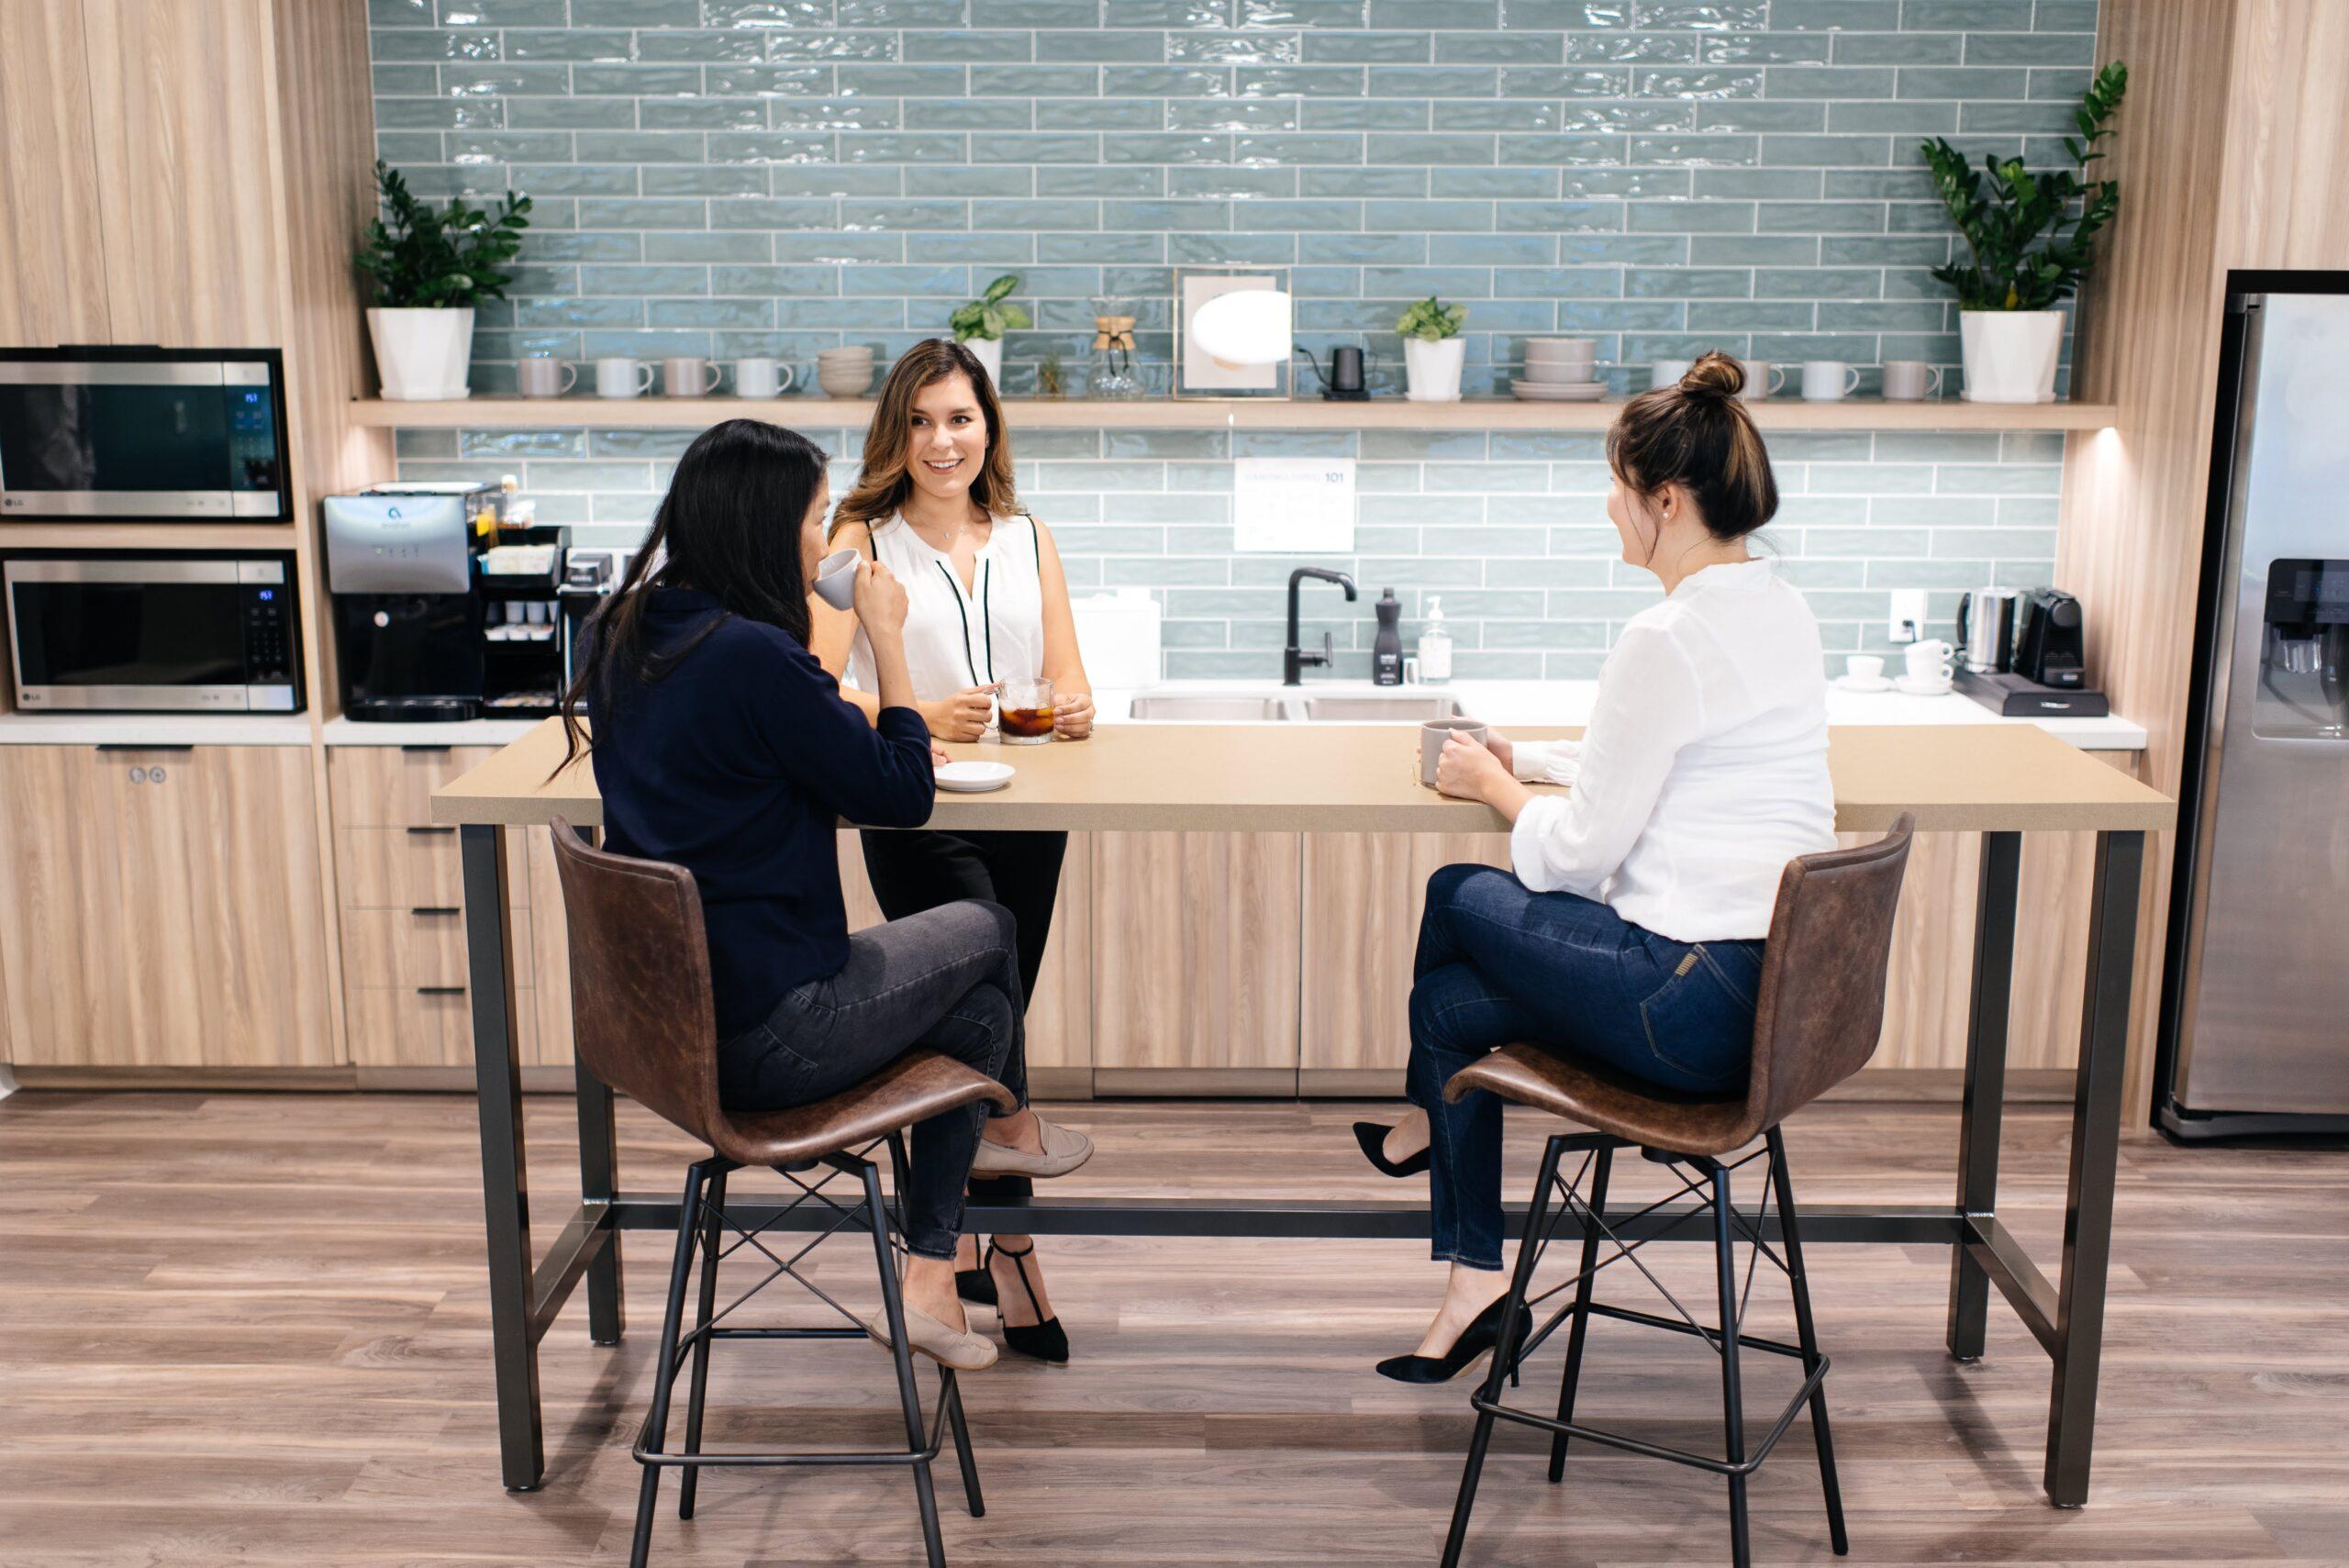 Provider Lounge at Ethera Irvine